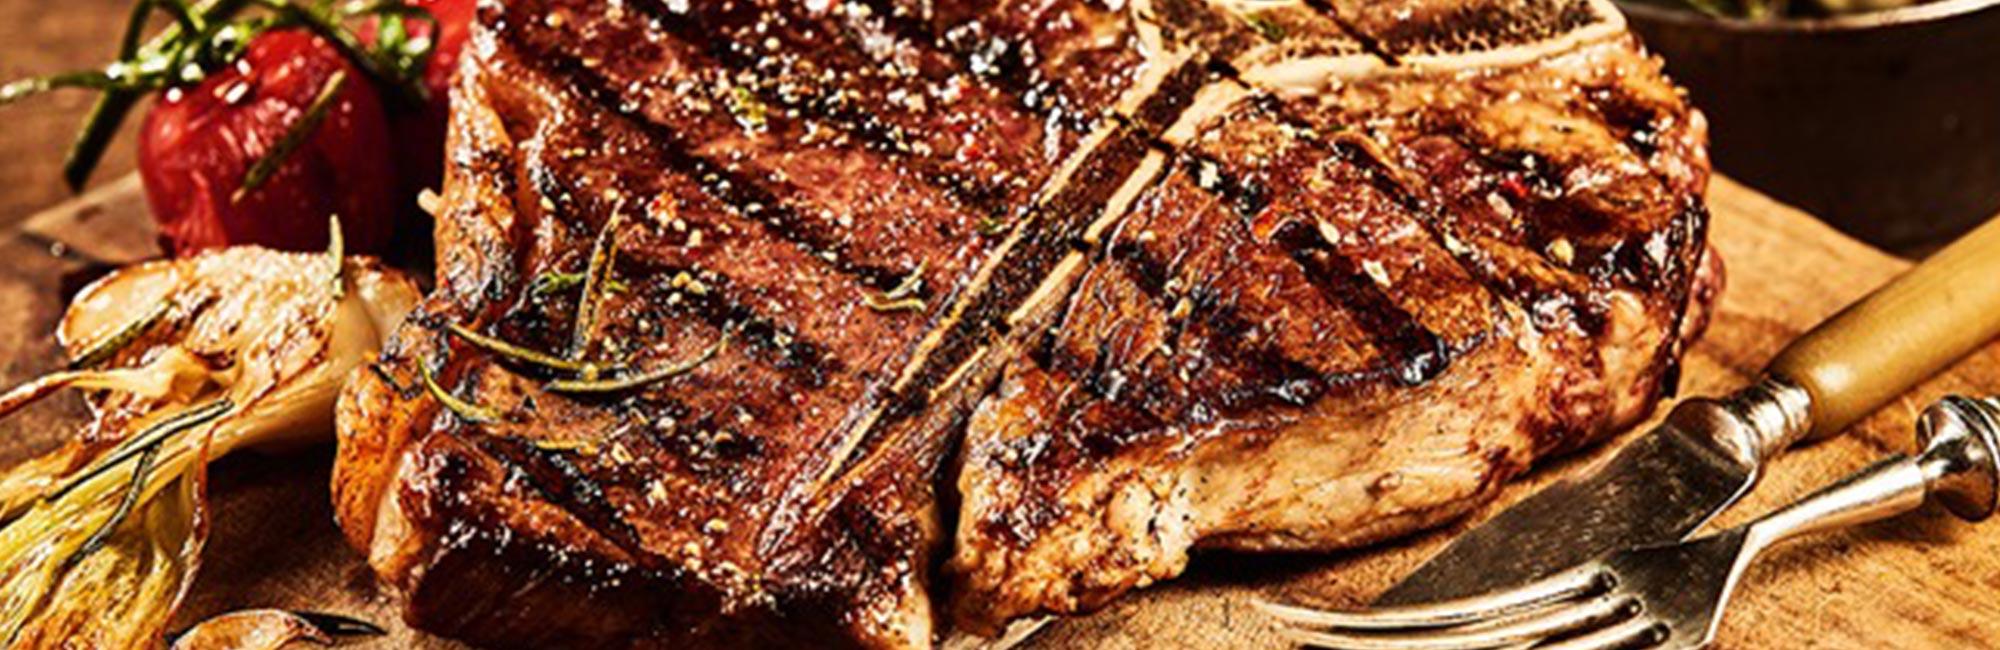 Asian Glazed T-Bone Steak with Minty Pineapple Salsa Recipe